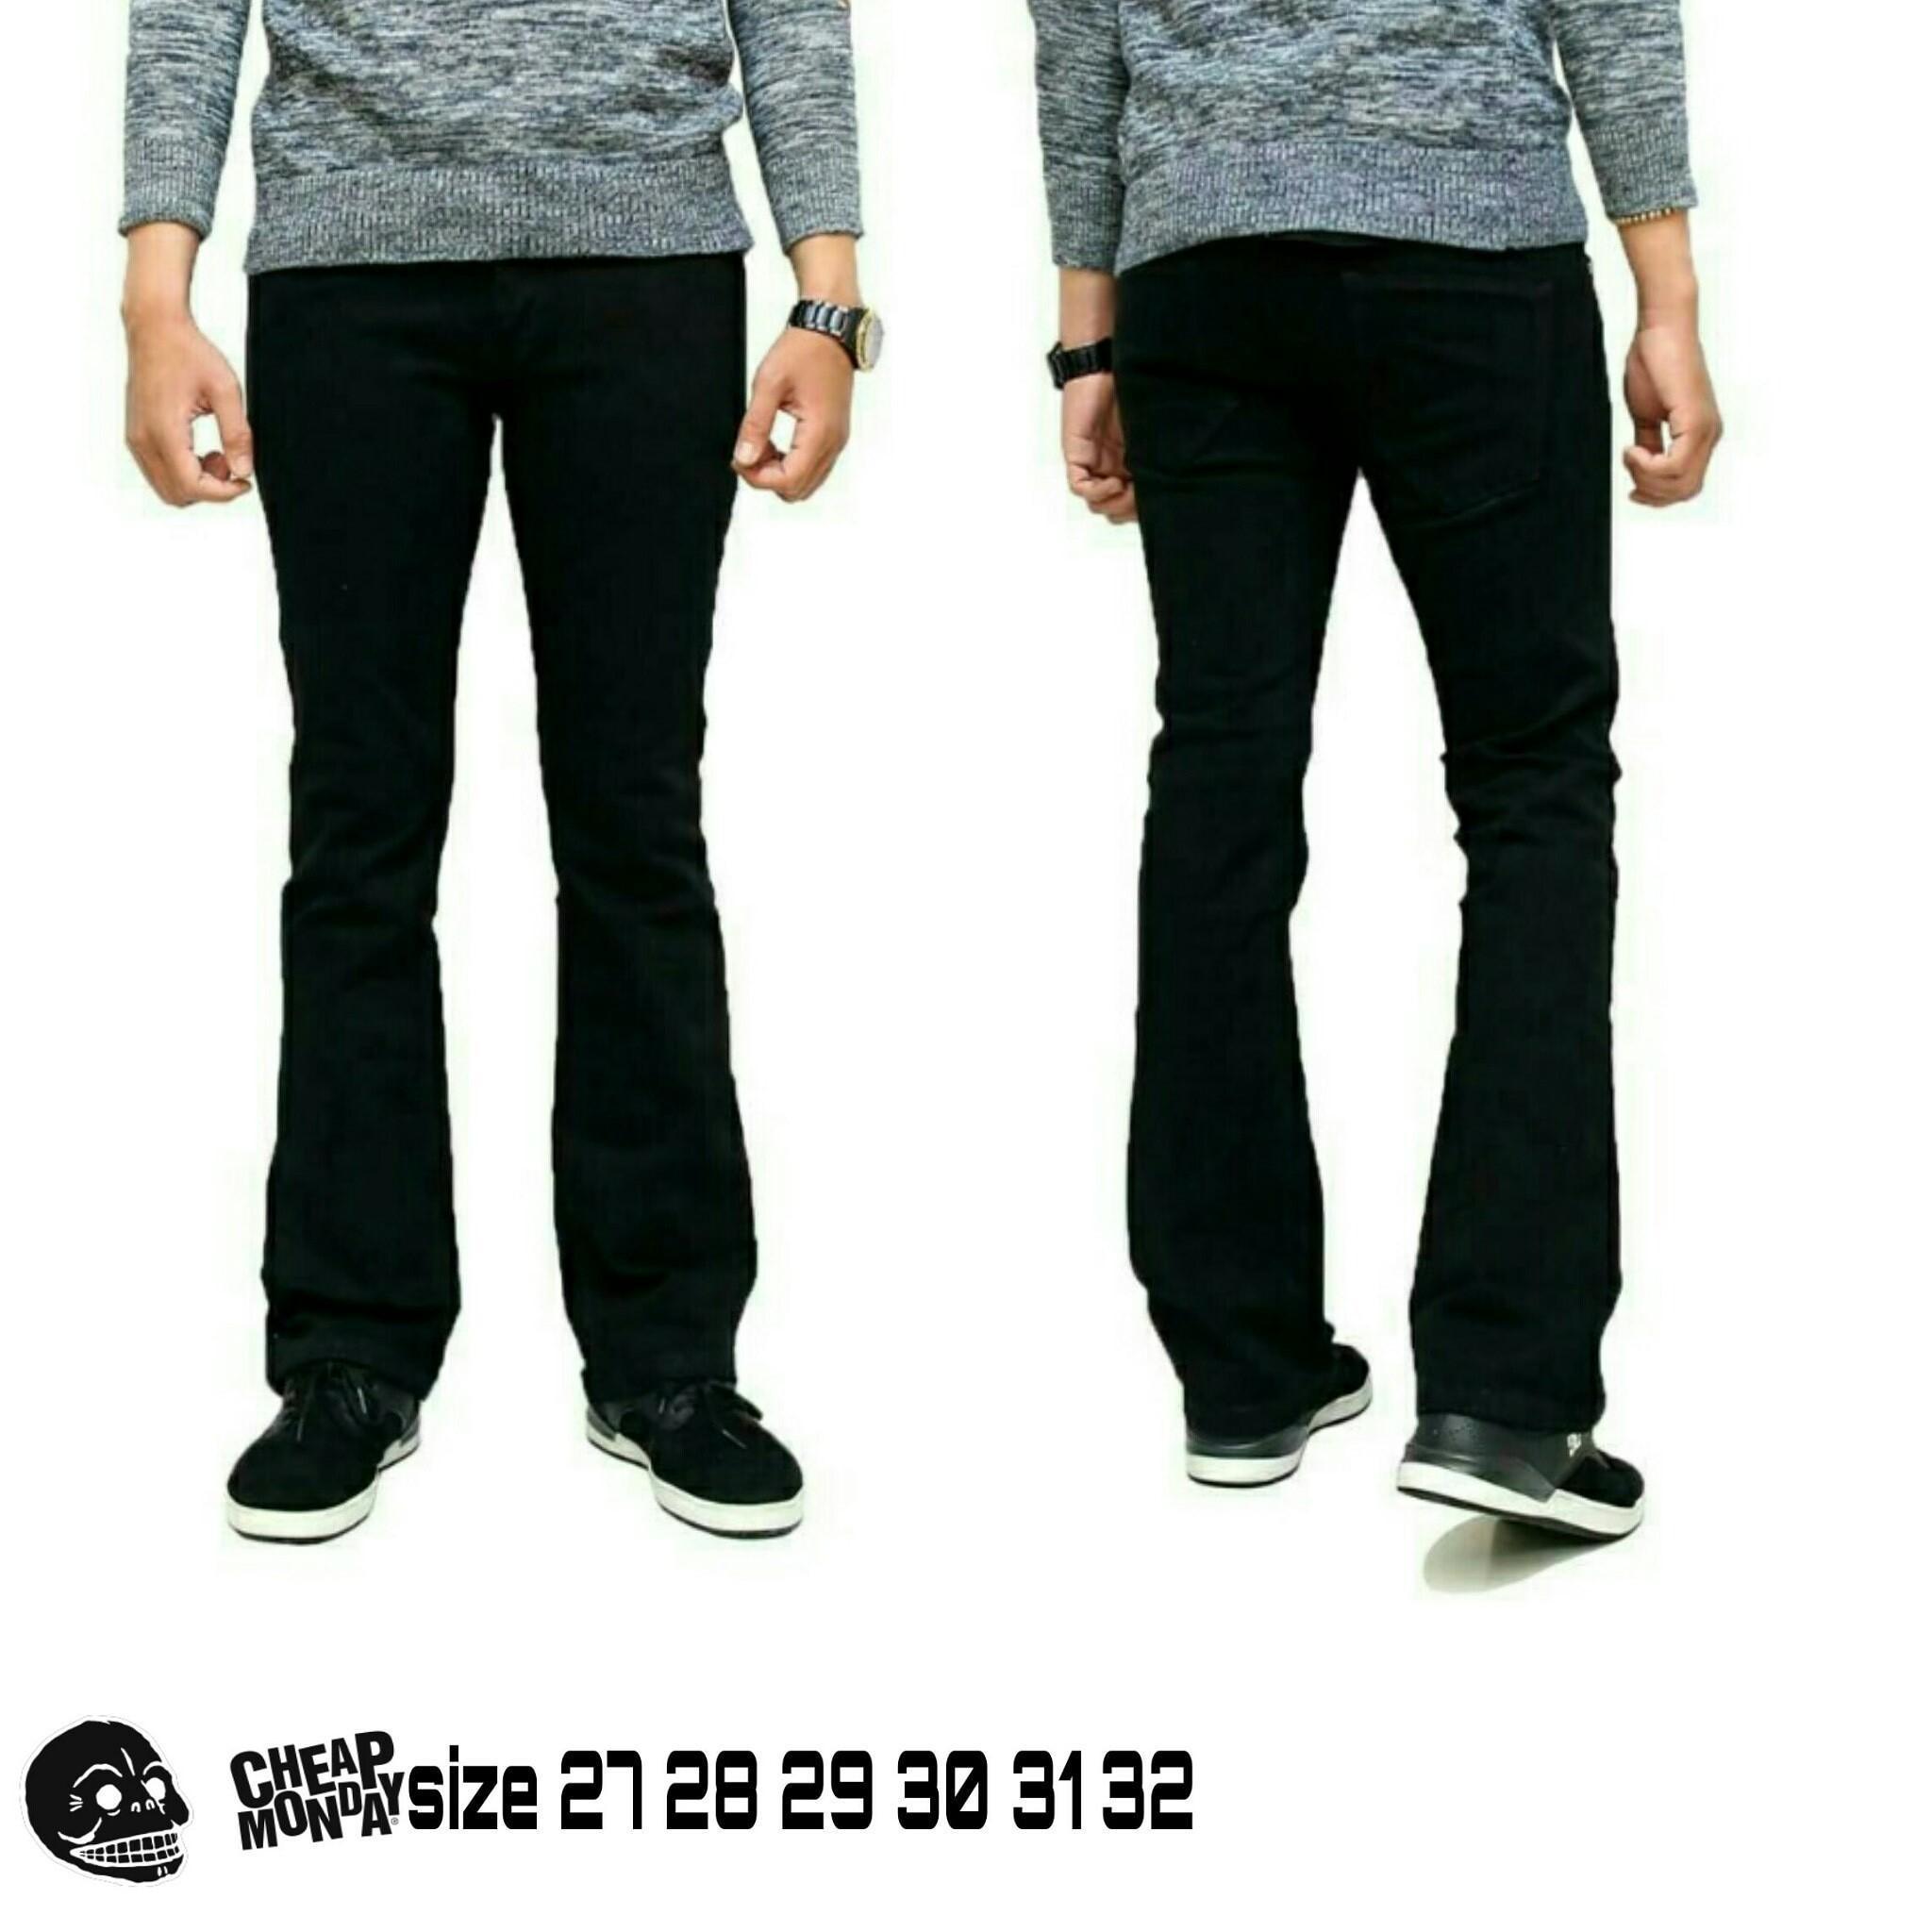 Celana jeans pria cutbray celana panjang cutbray hitam